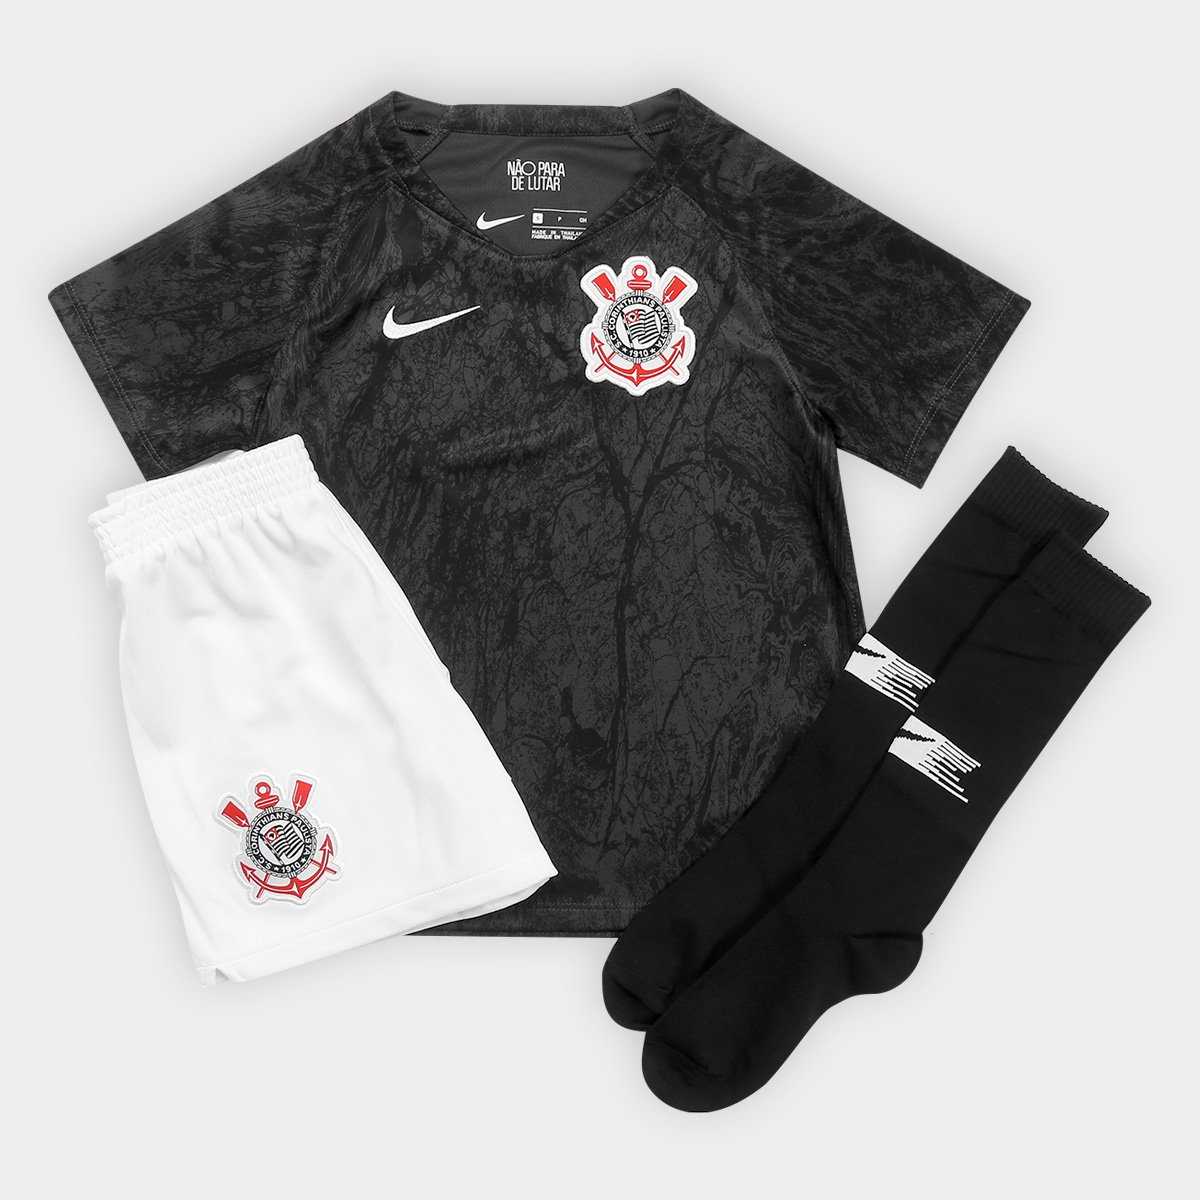 Kit Corinthians Infantil II 2018 s n° Torcedor Nike - Compre Agora ... c453e52cfd38d